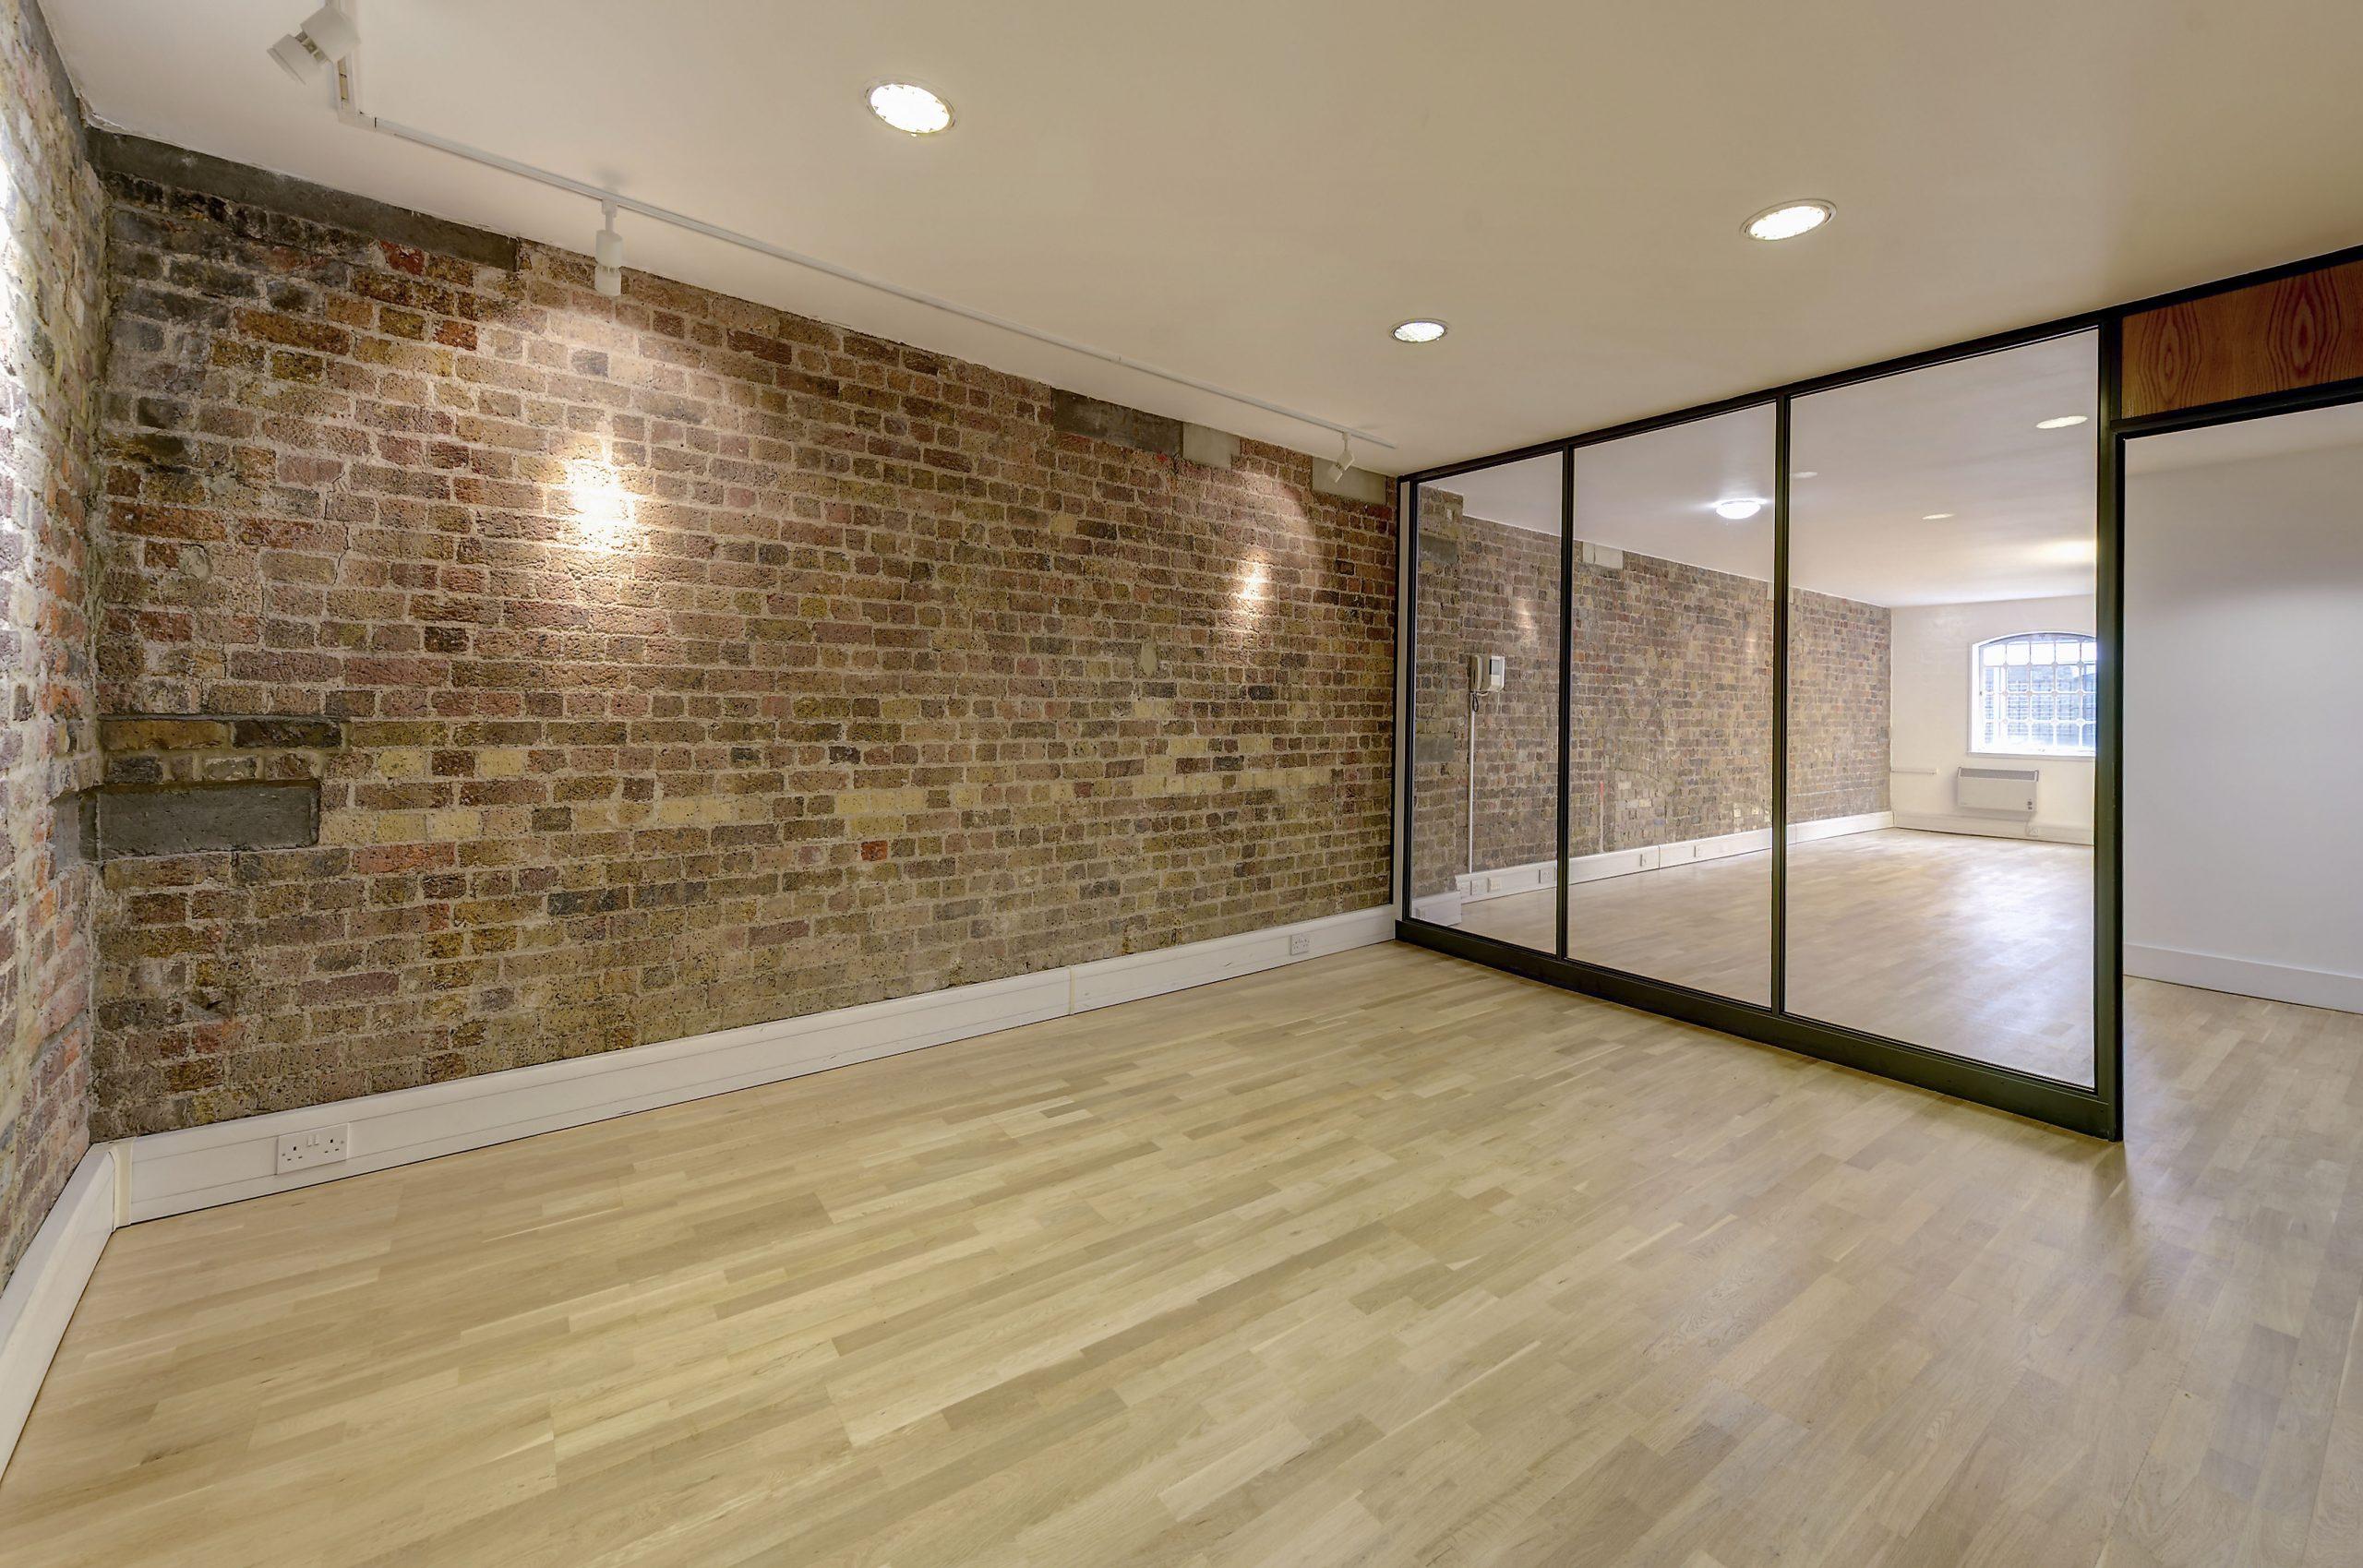 5 Maidstone Building Mews, London, SE1 1GN